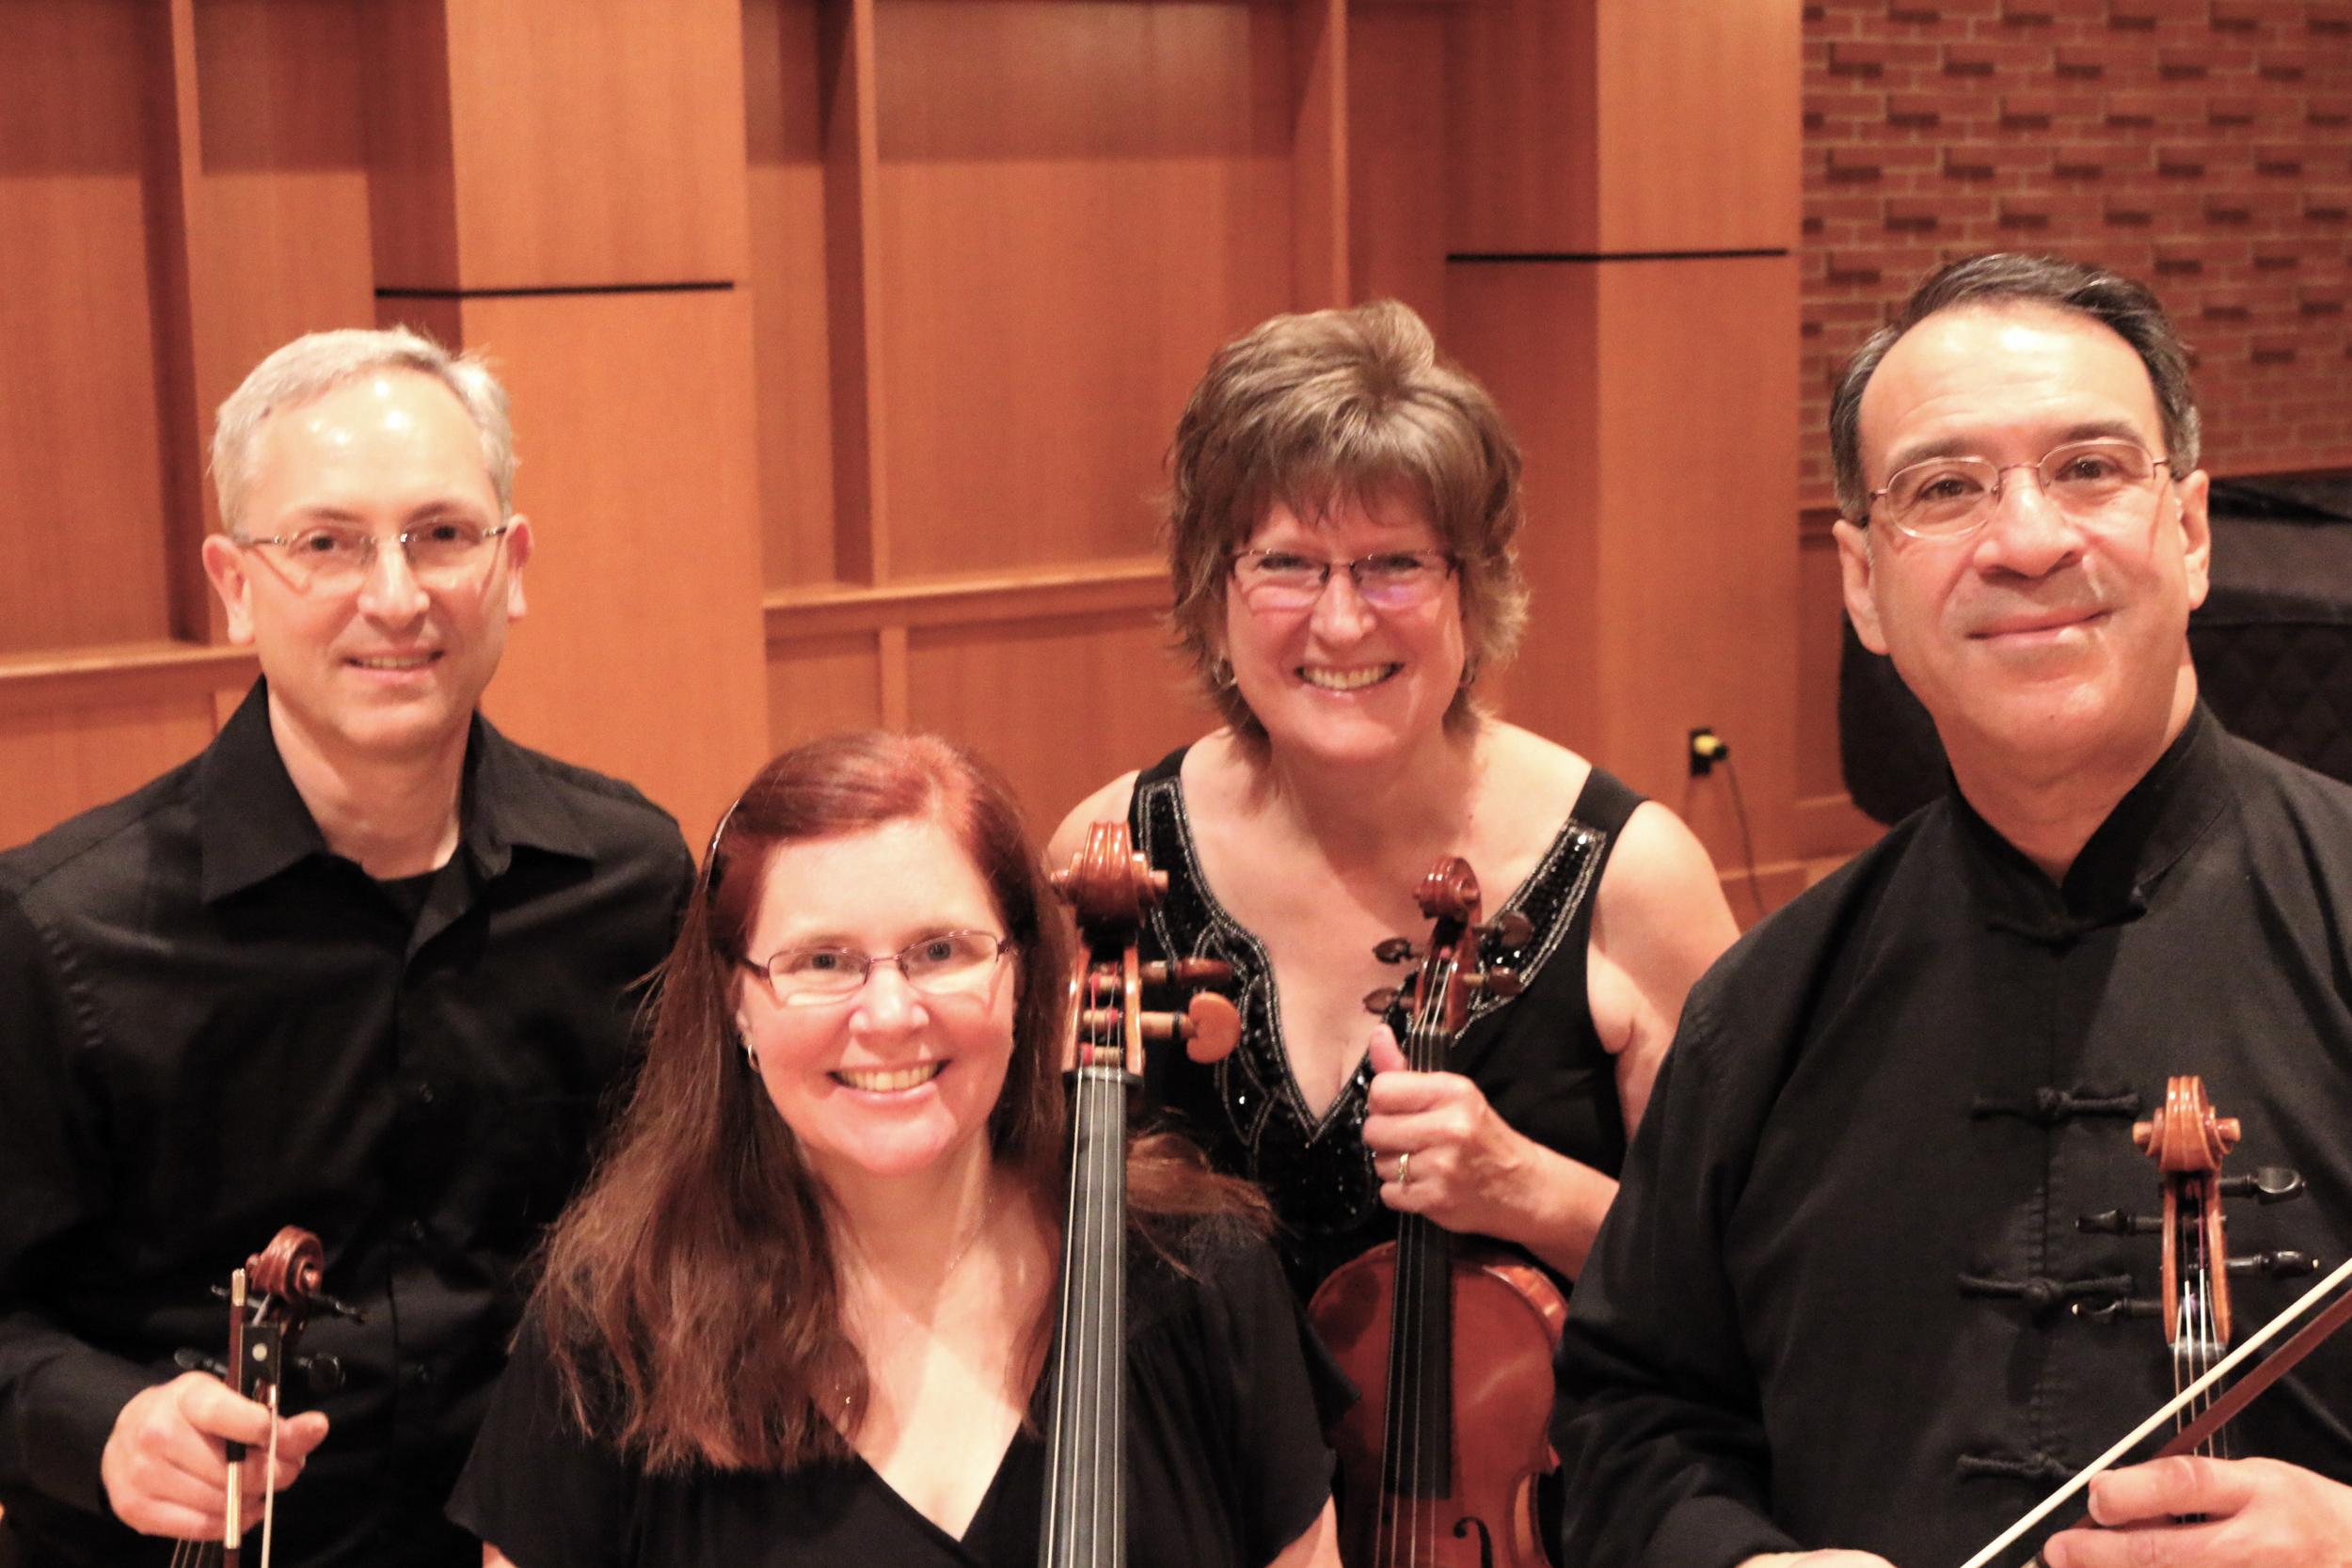 Marcus Smolensky and Priscilla Auer, violins; Christopher Para, viola; Rachel Kauffman, cello